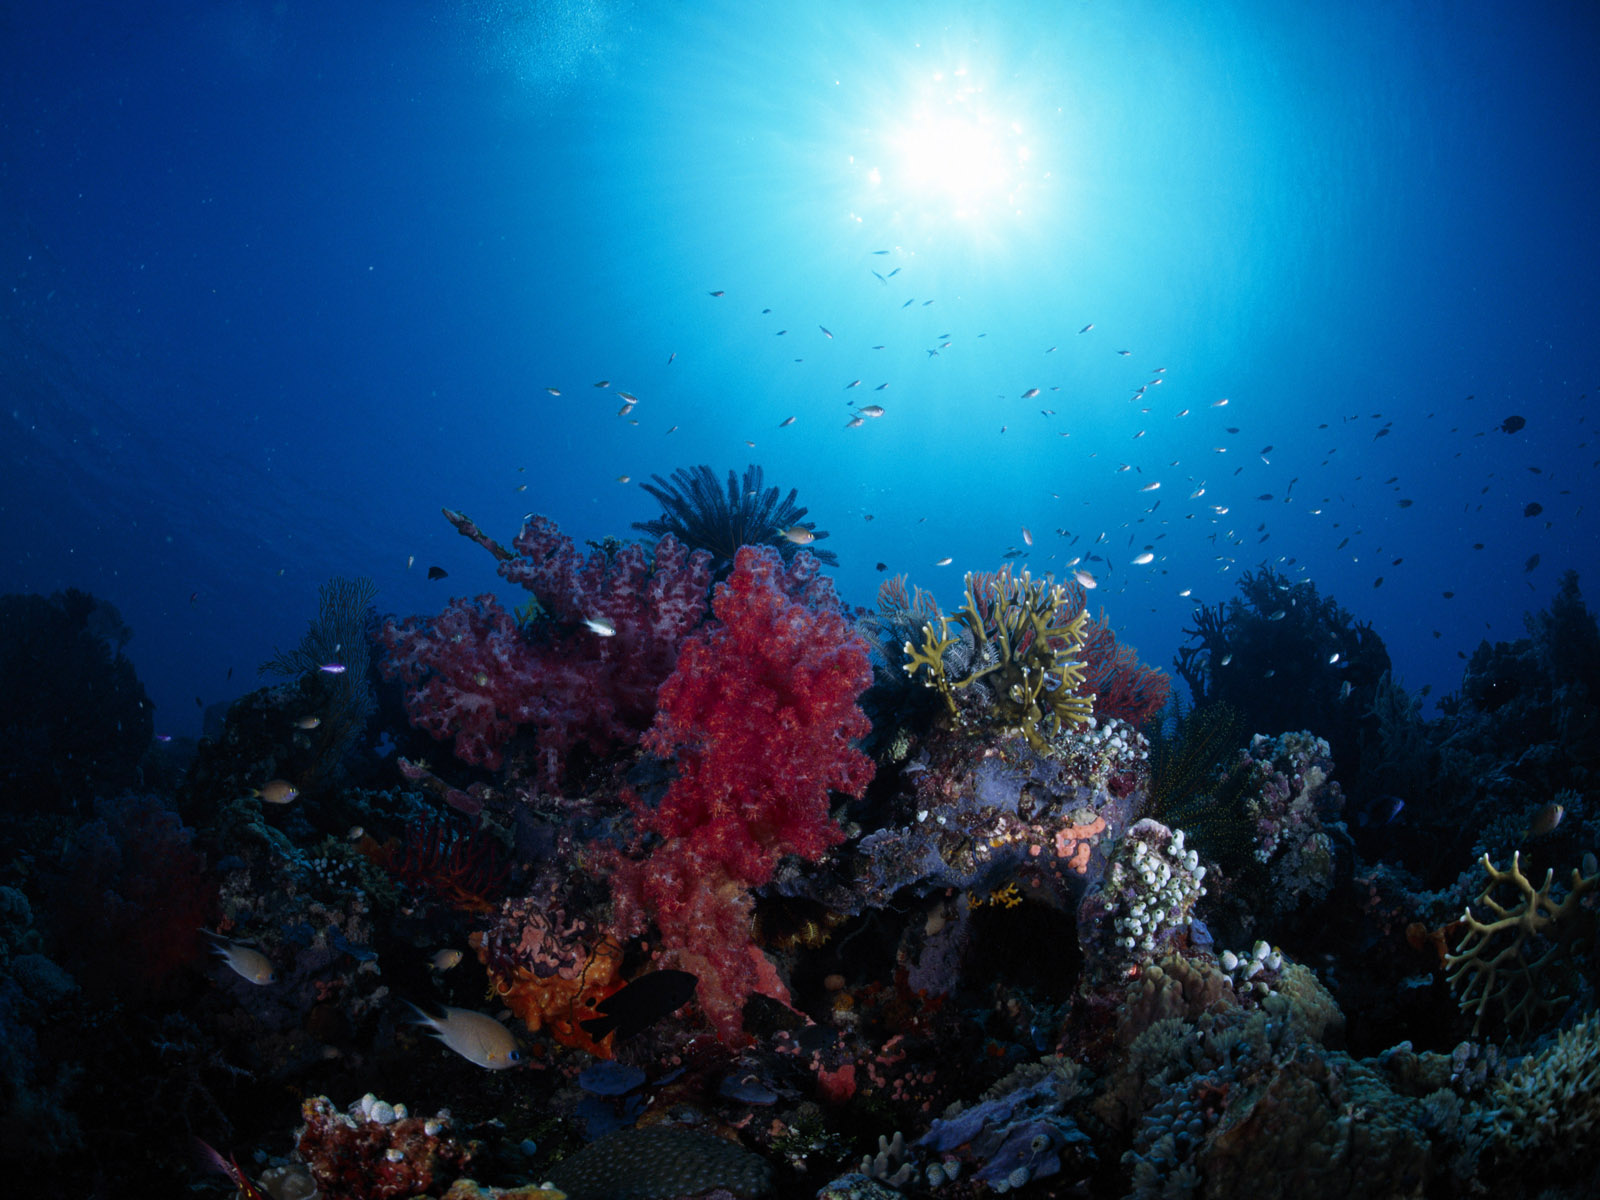 Deep Blue Sea Wallpapers Backgrounds Desktop Wallpapers 1600x1200